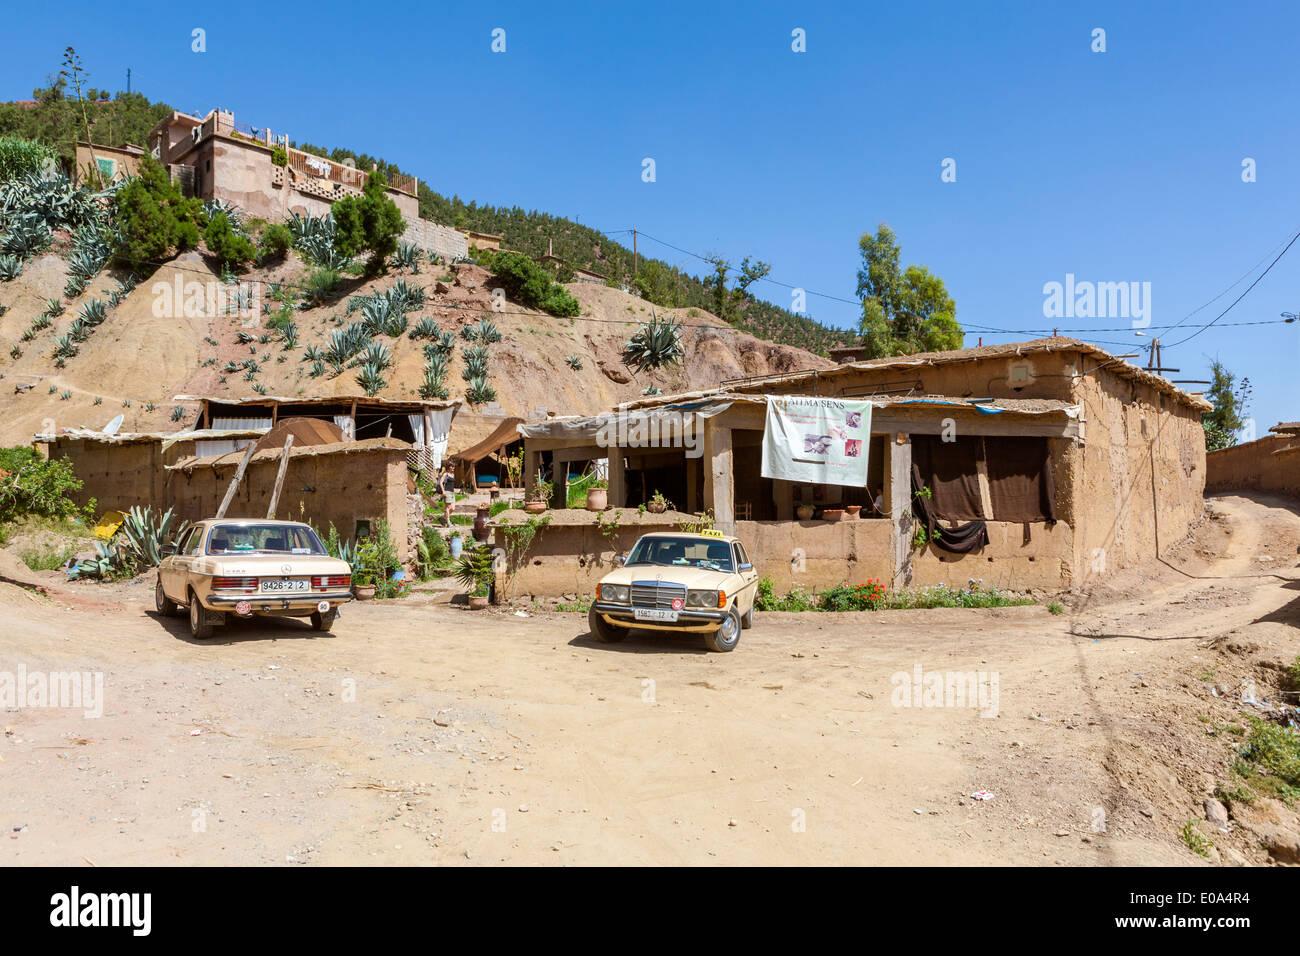 Ourika Valley, Setti-Fatma village near Marrakesh, Morocco, North Africa Stock Photo